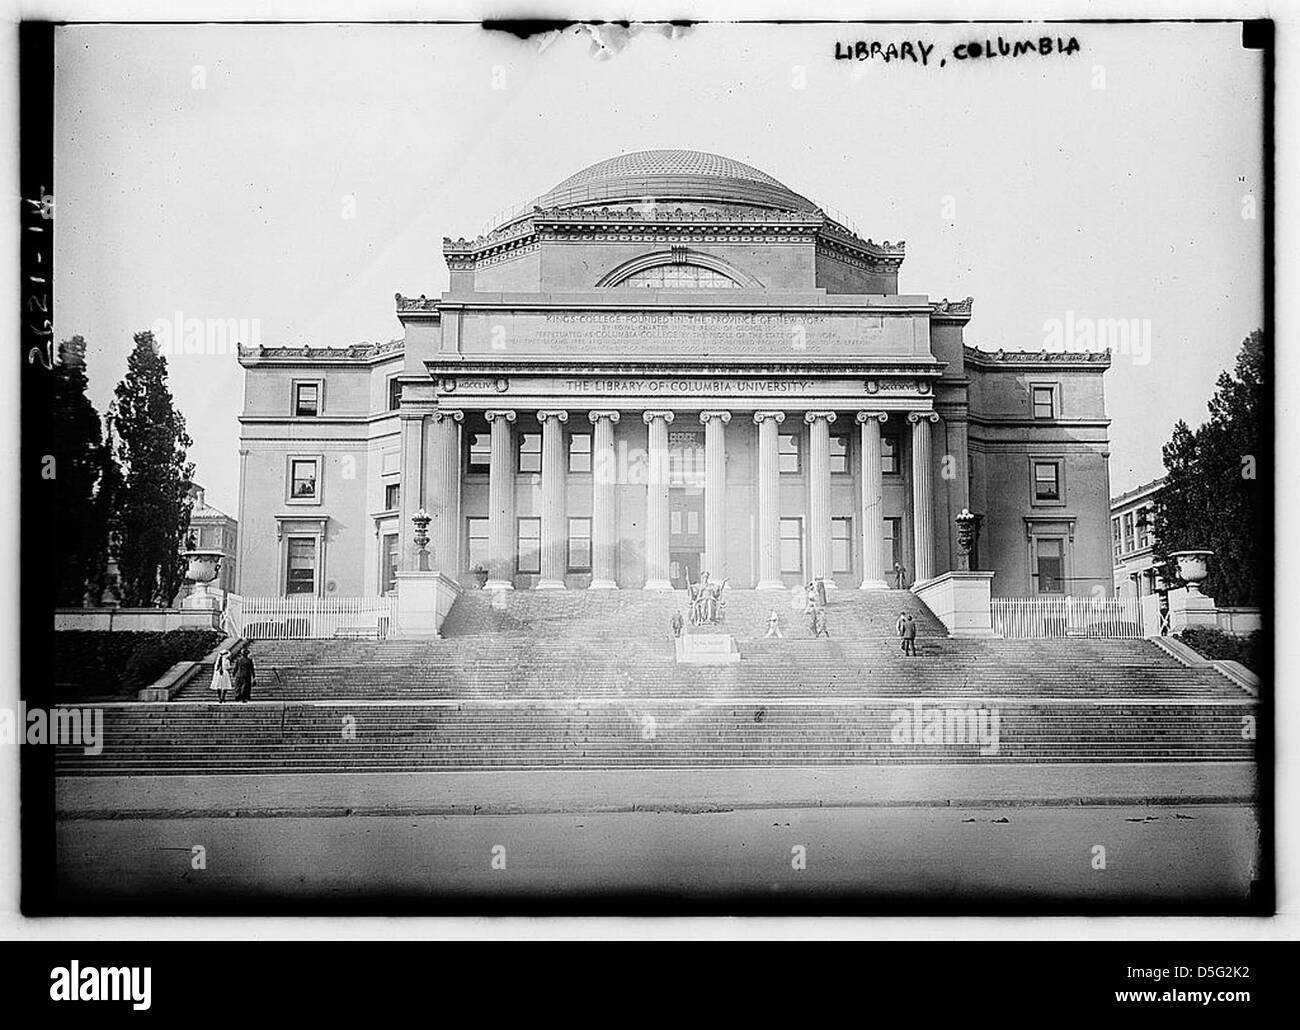 Library - Columbia (LOC) - Stock Image